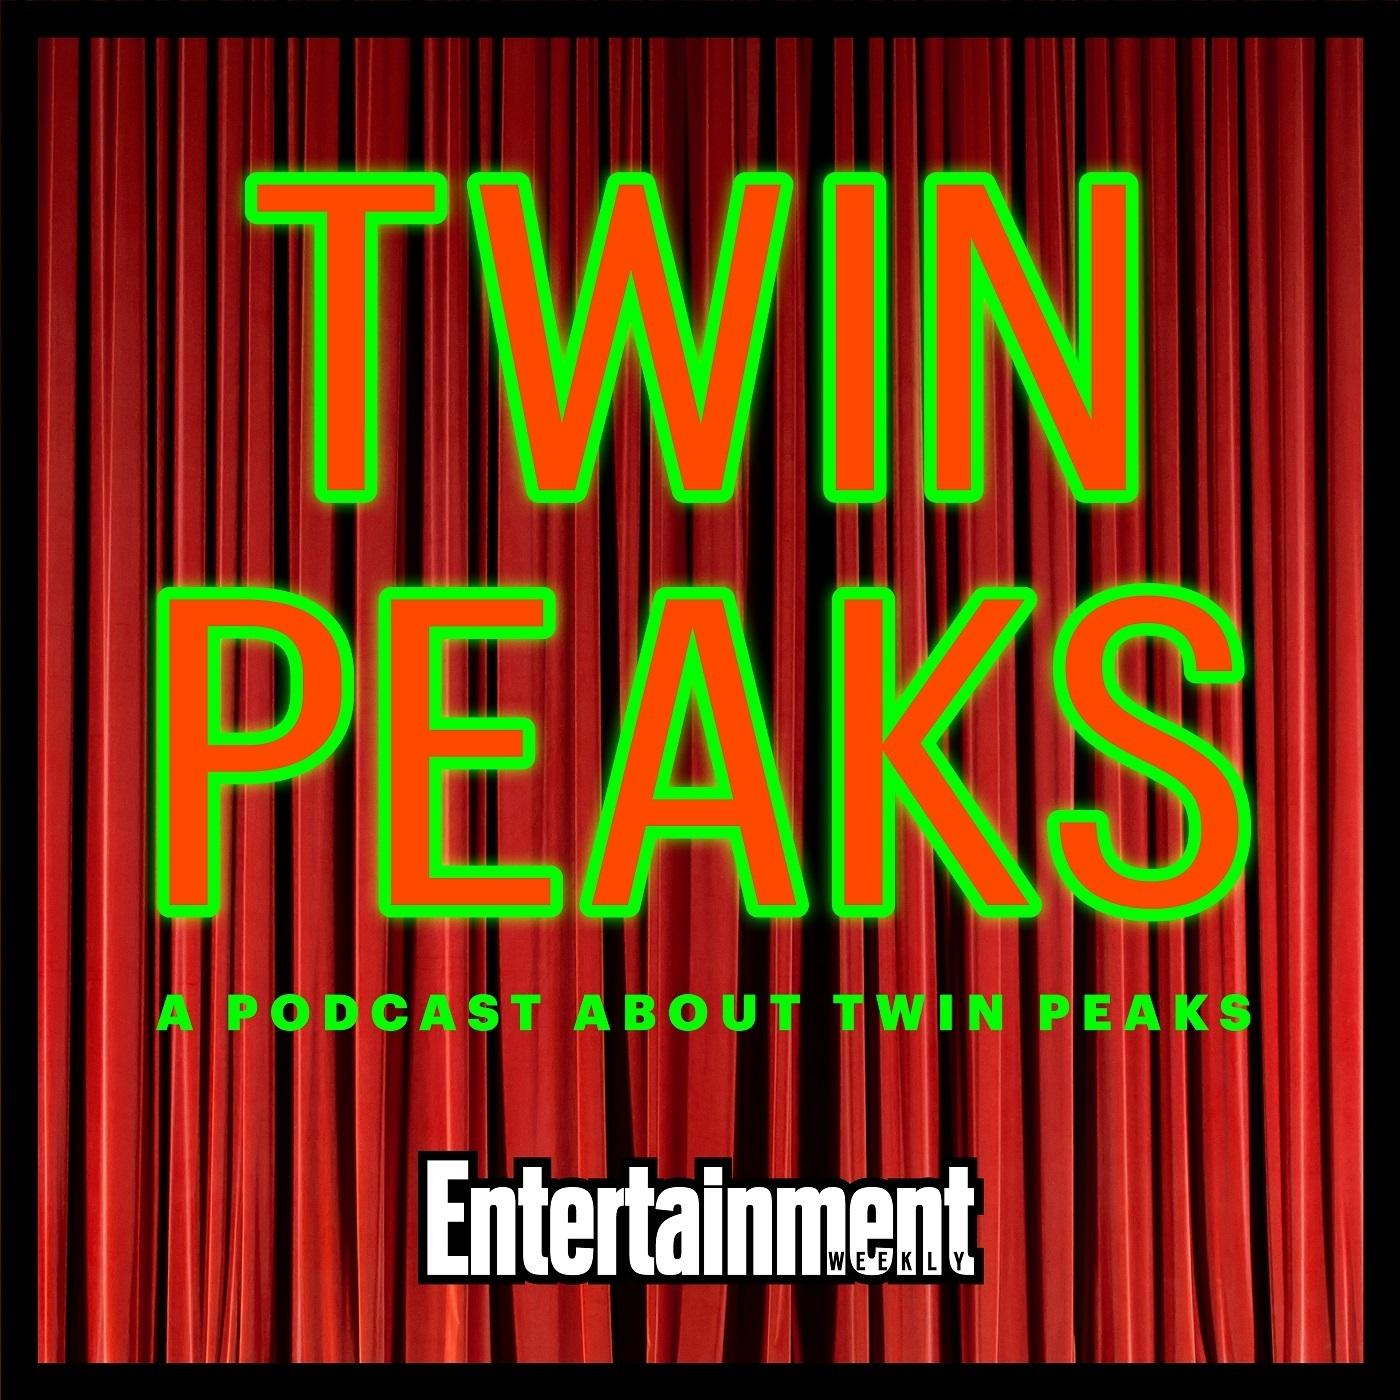 Twin Peaks: The Podcast Return